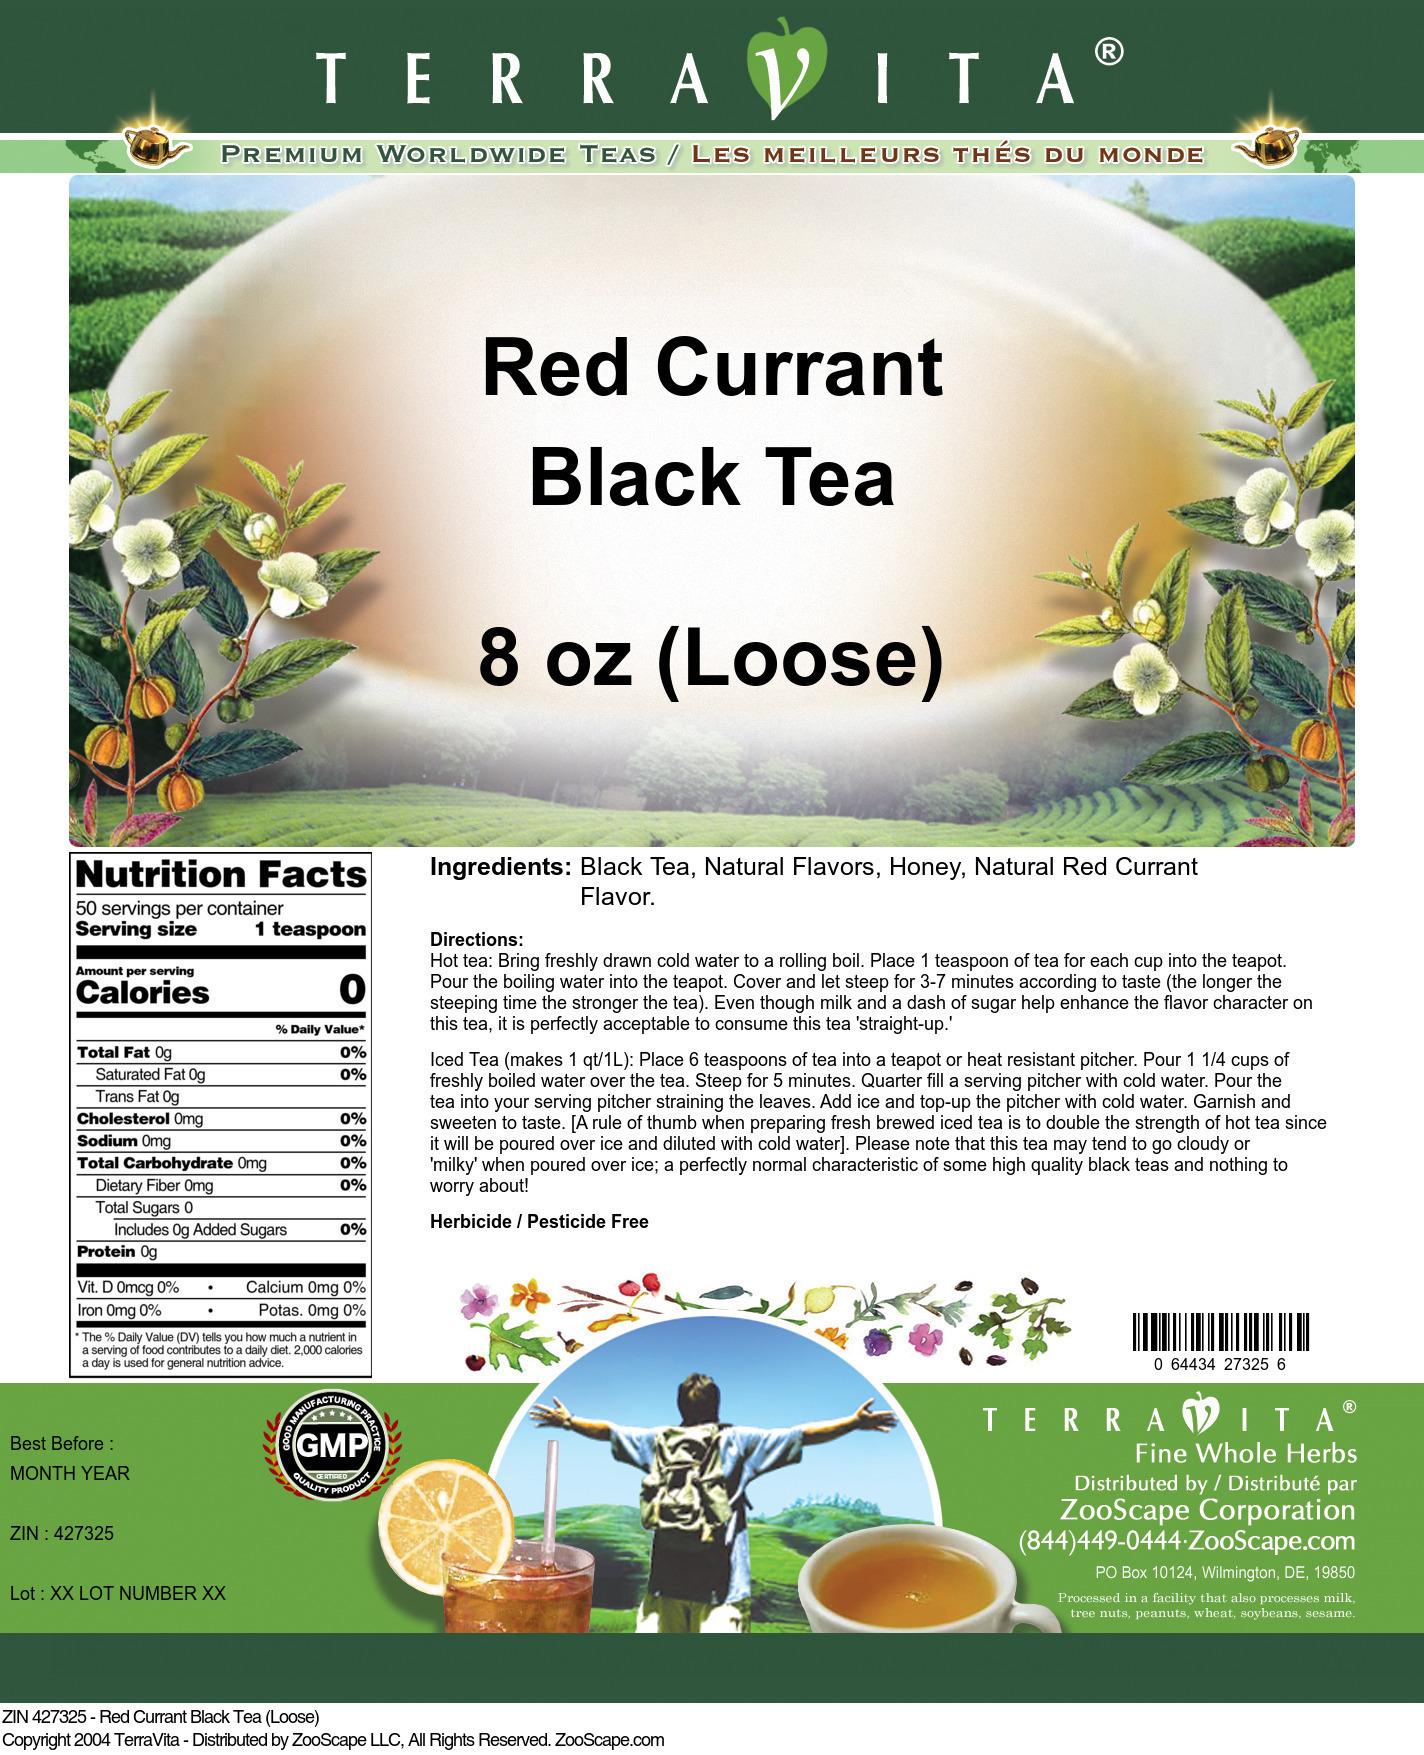 Red Currant Black Tea (Loose)